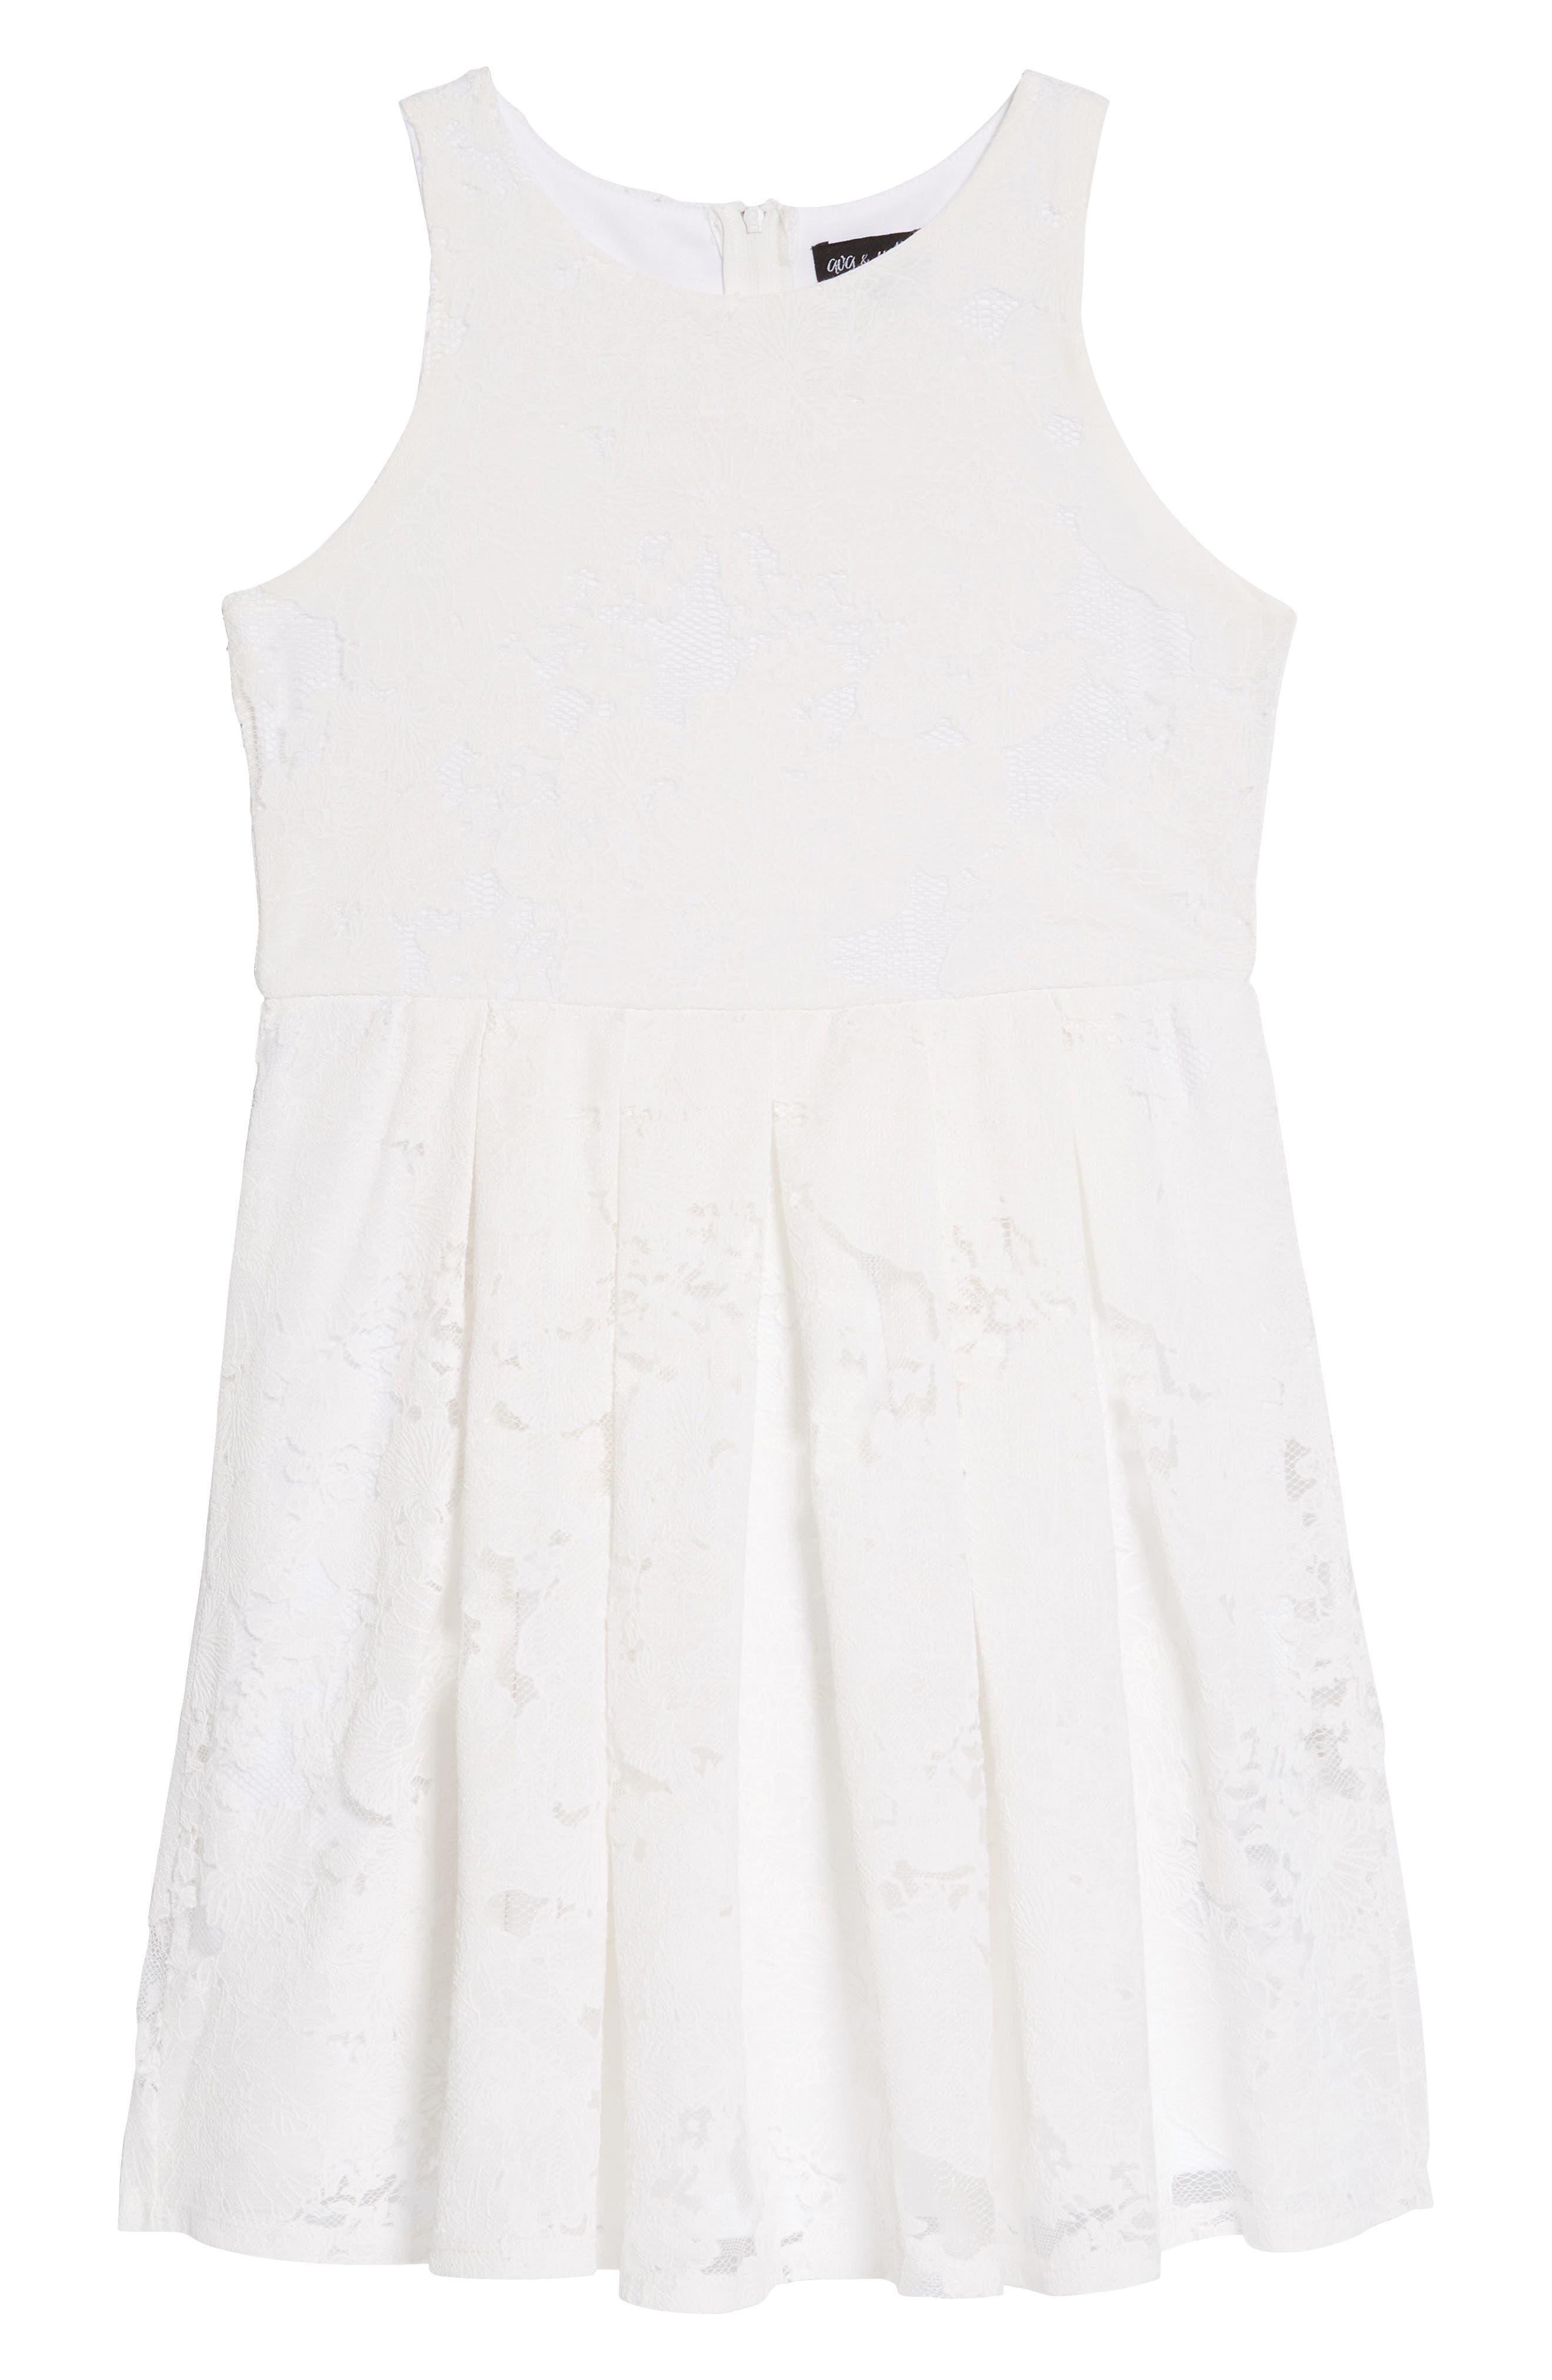 Lace Overlay Skater Dress,                             Main thumbnail 1, color,                             100